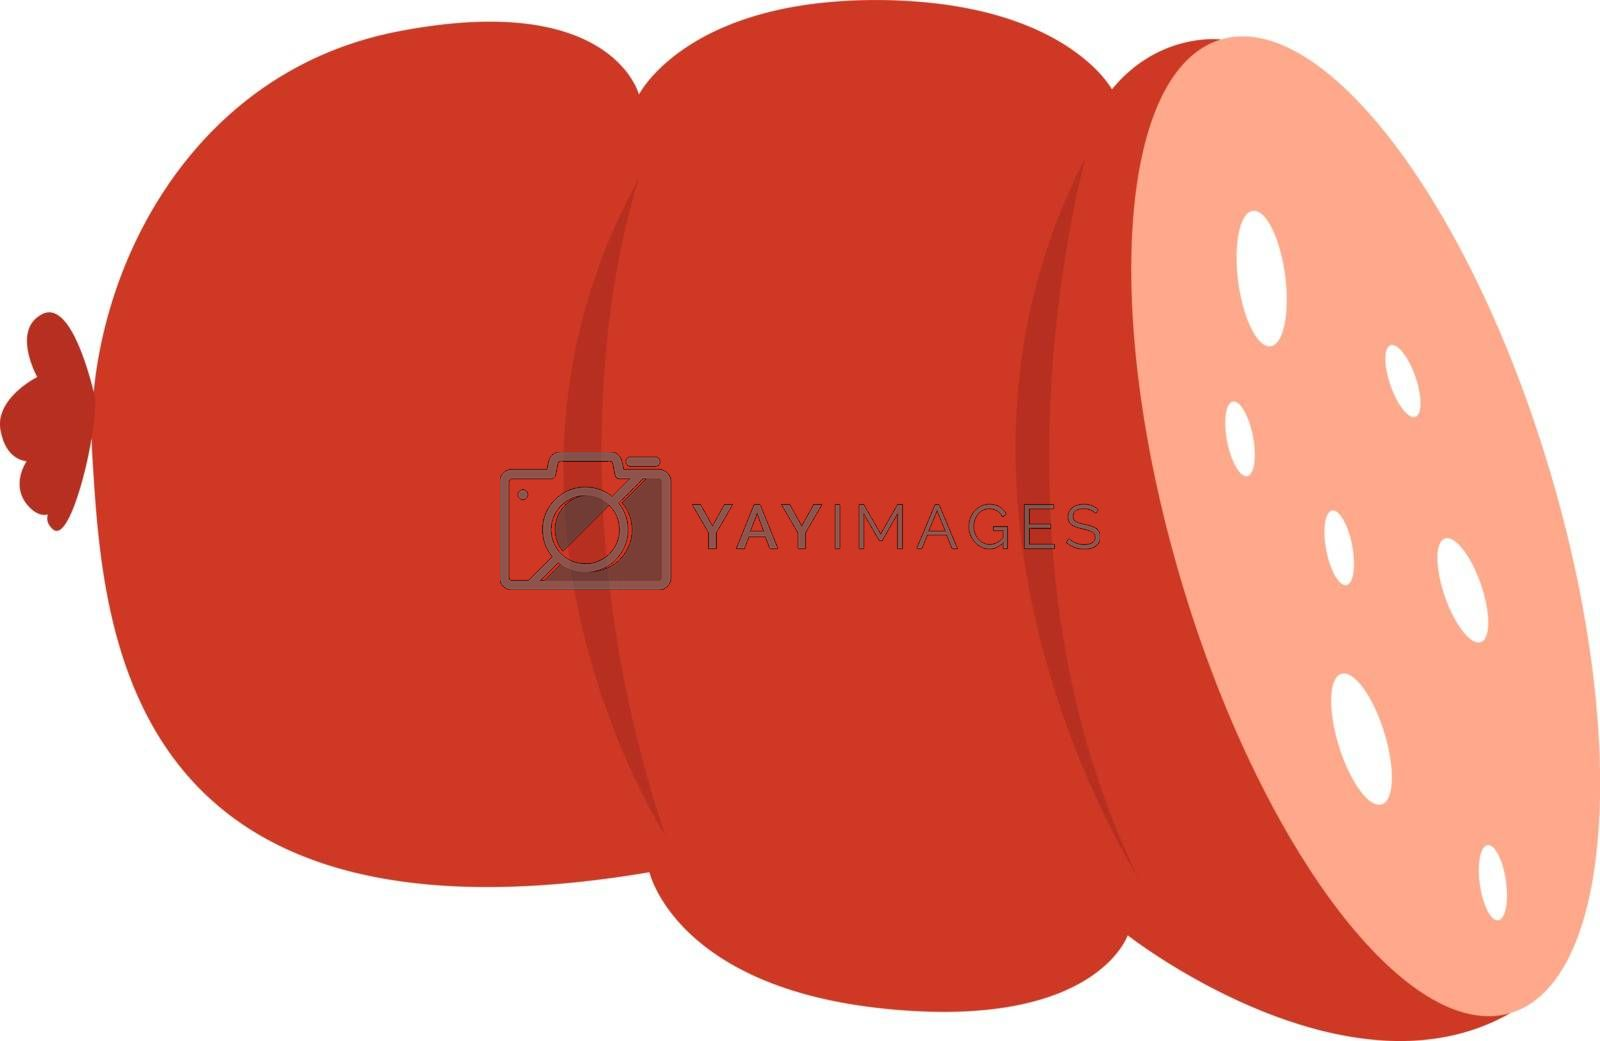 Sausage, illustration, vector on white background.